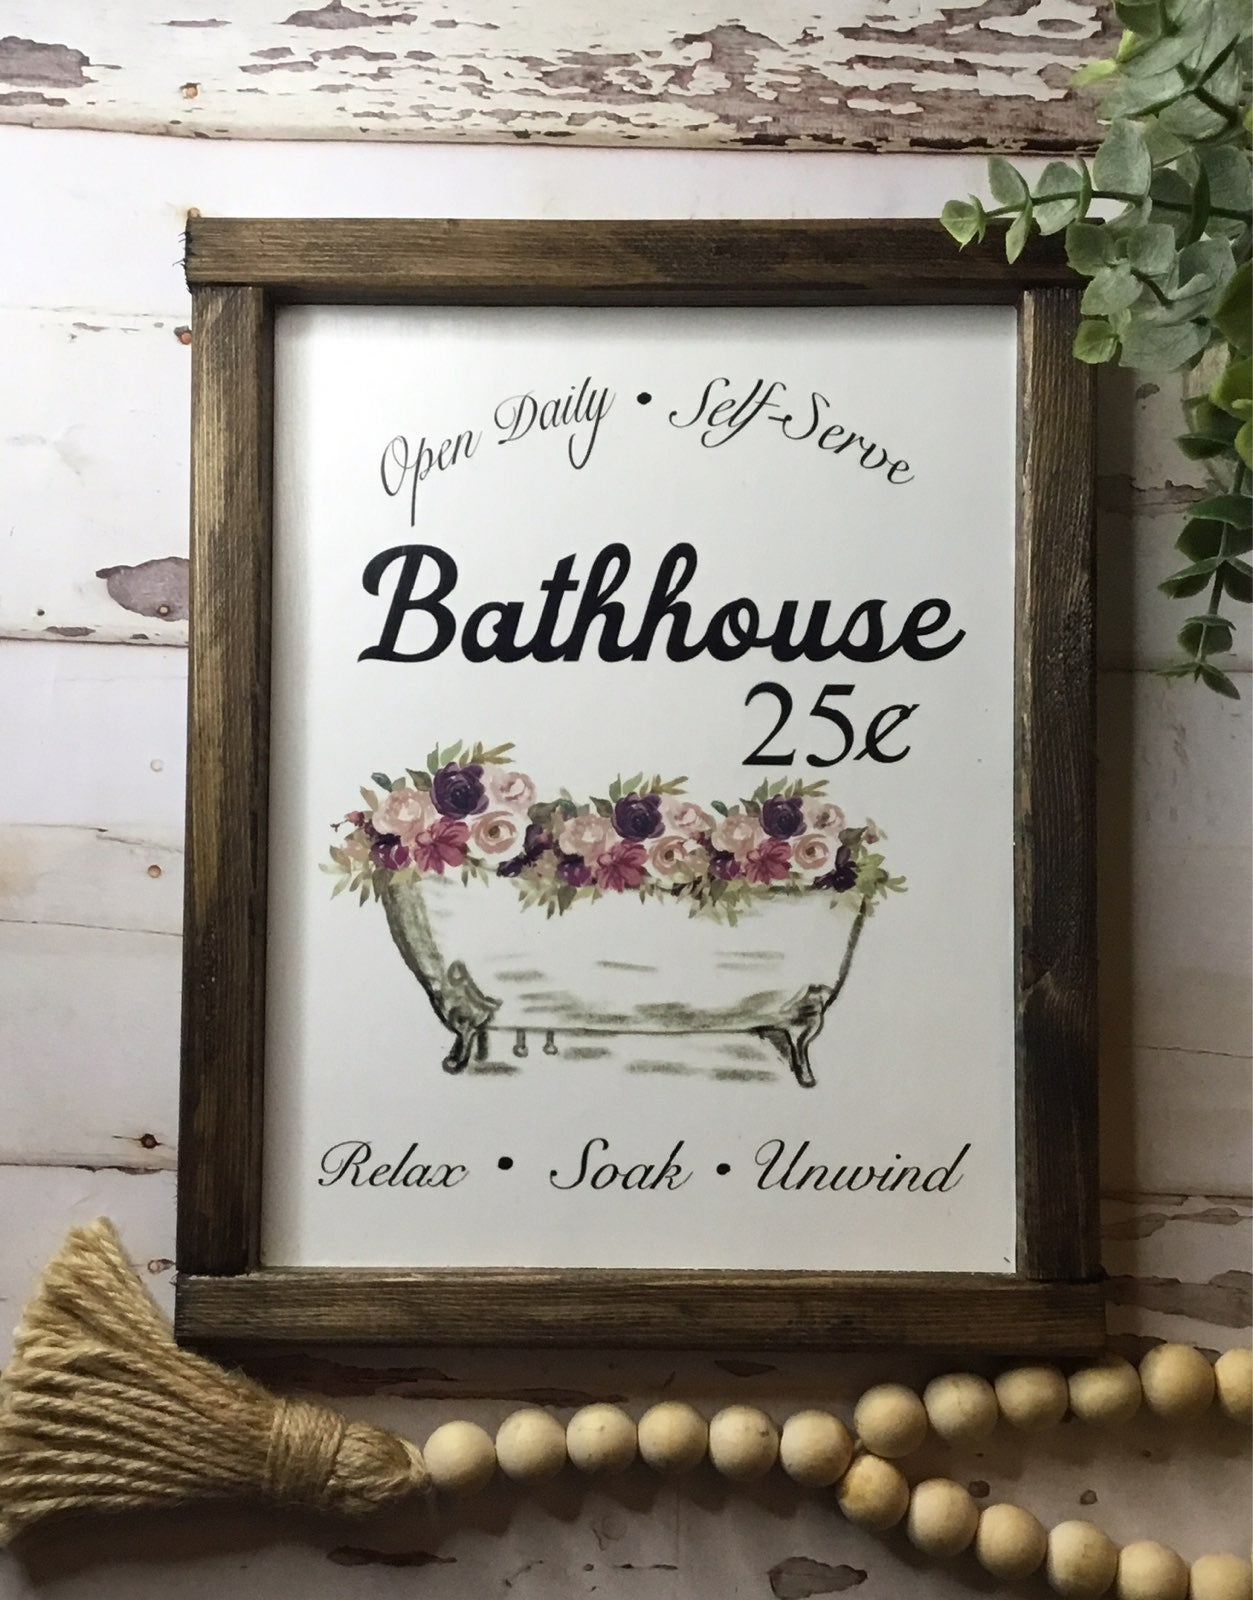 Bathouse clawfoot bathrub wooden sign